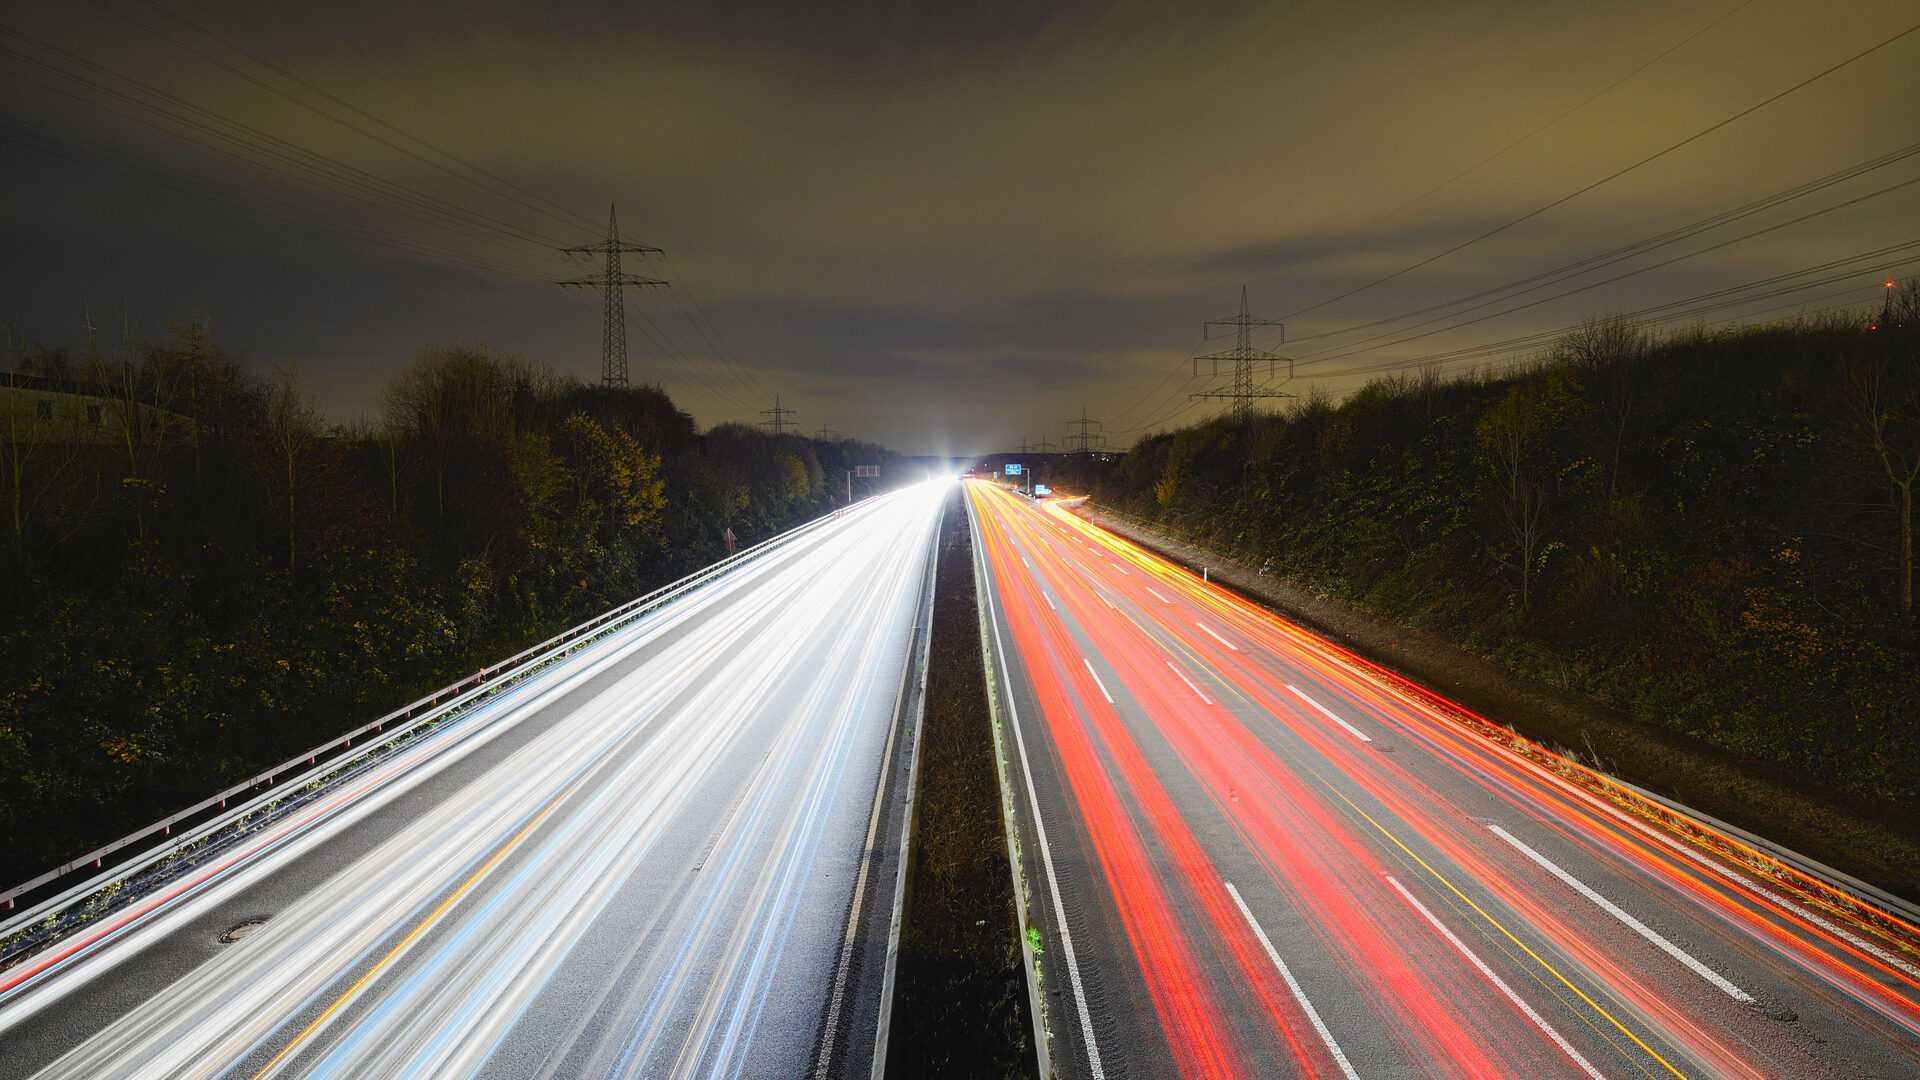 maximumsnelheid van 130 km/u op de snelweg